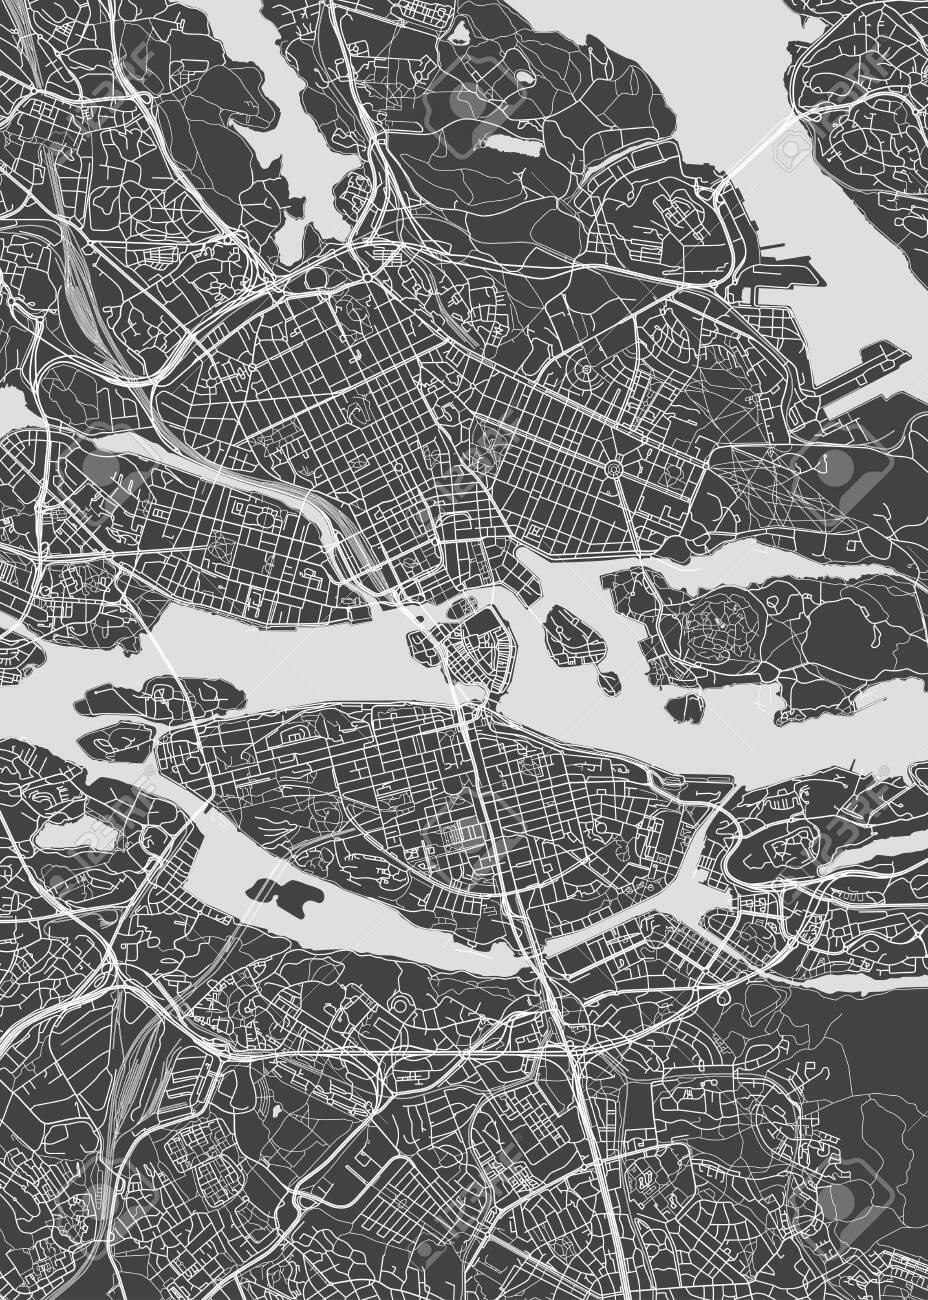 City map Stockholm, monochrome detailed plan, vector illustration for your design - 123721494